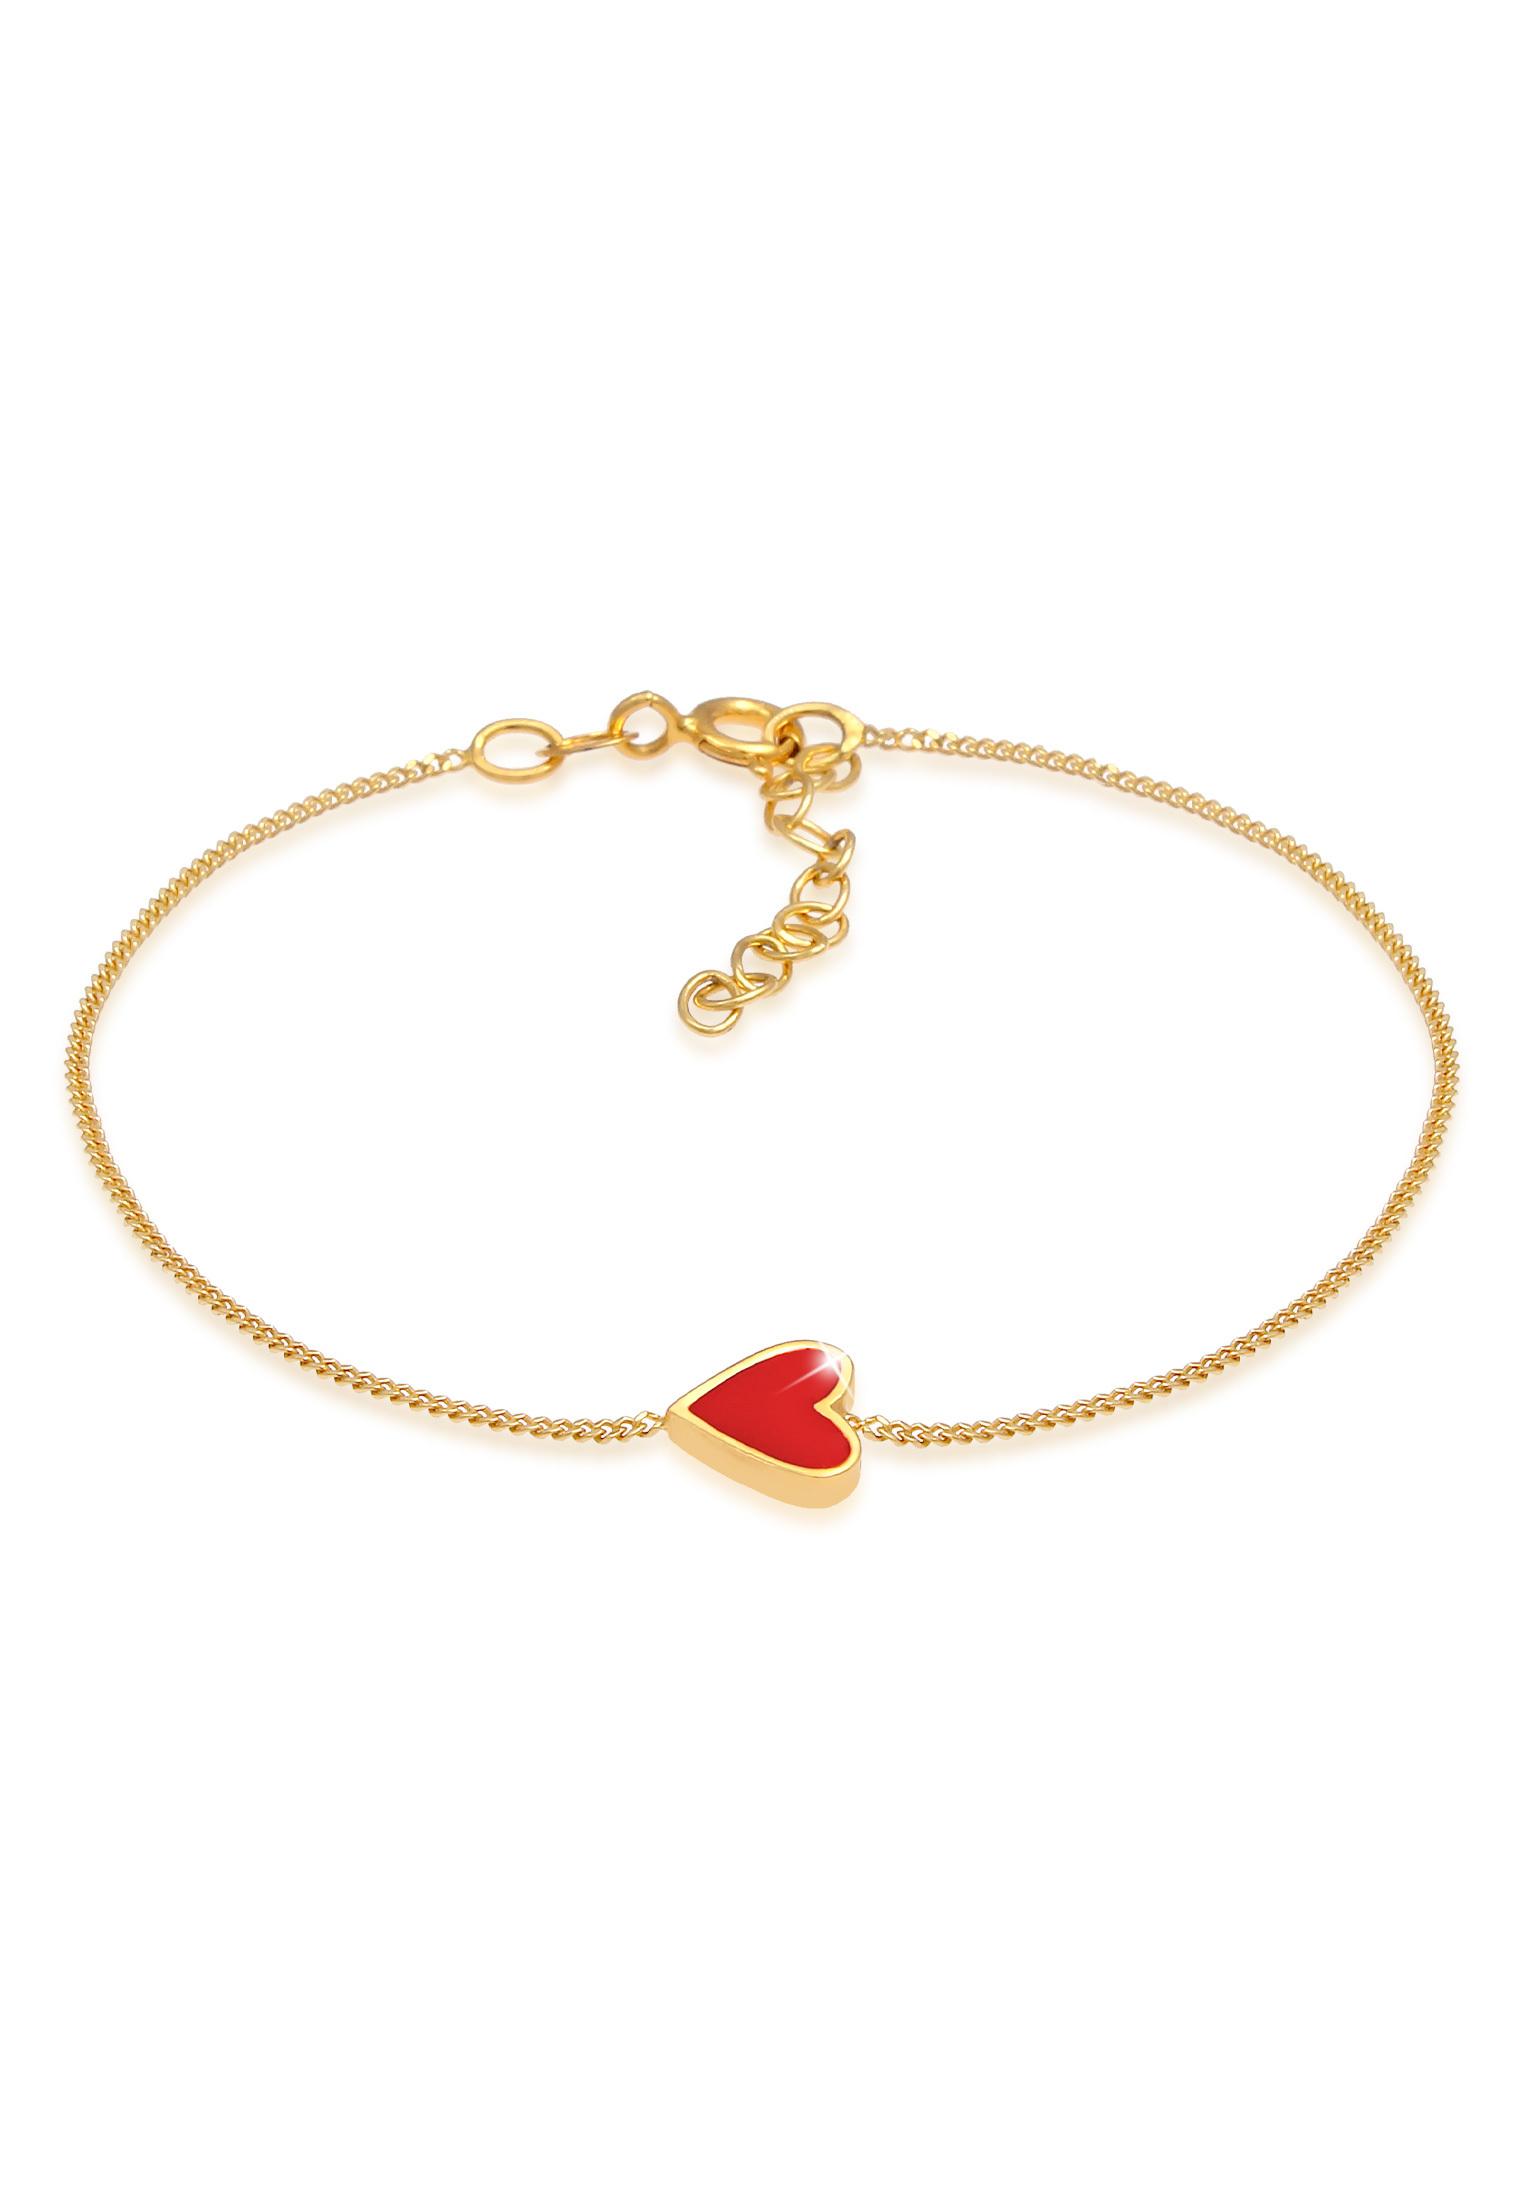 Armband Herz | 925 Sterling Silber vergoldet